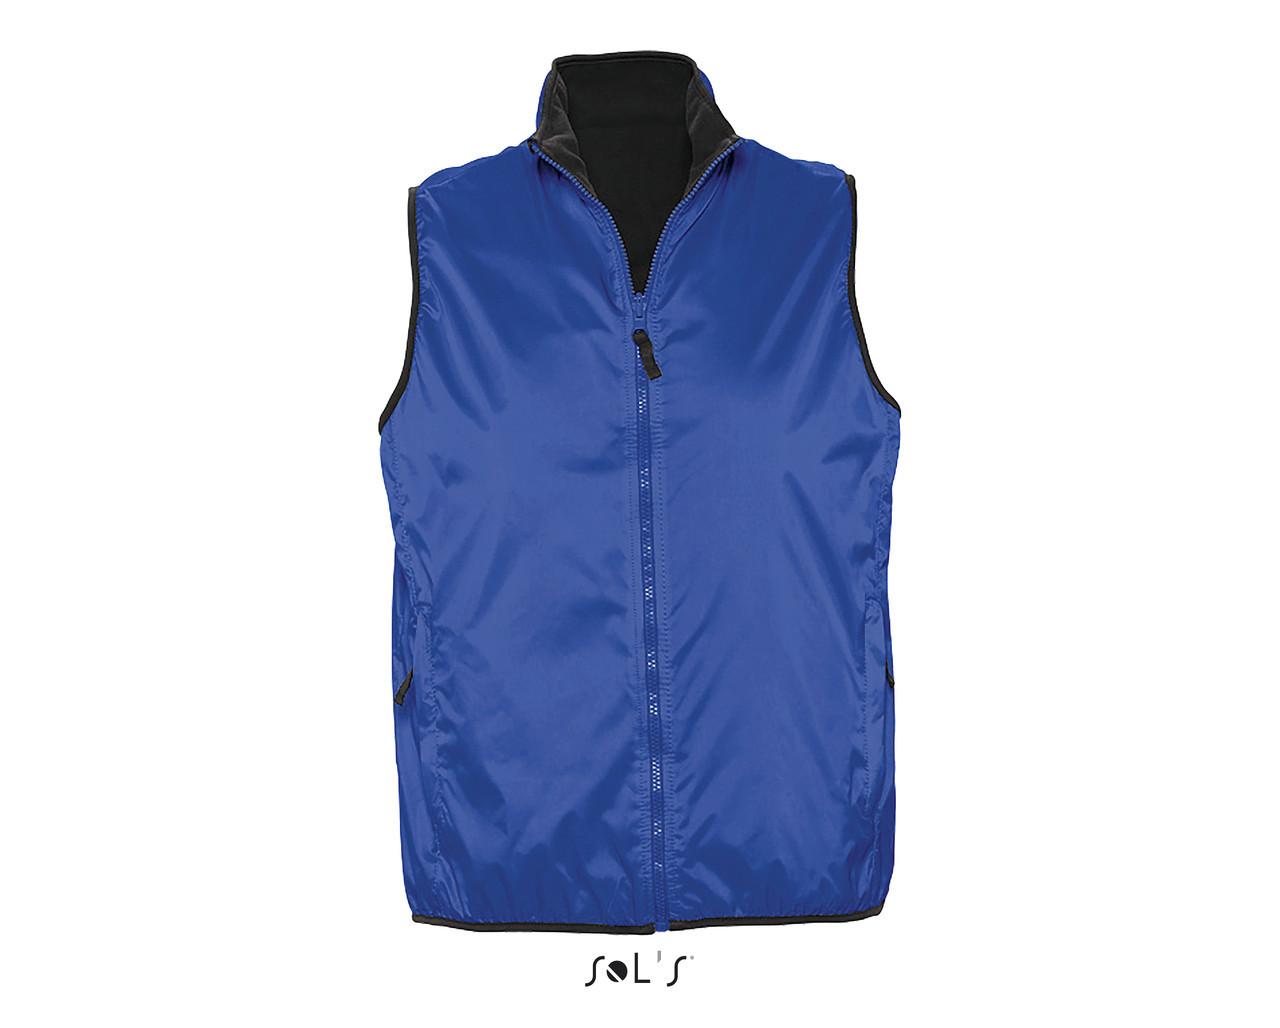 Жилет унисекс  двухсторонний, цвет синий, размер XL